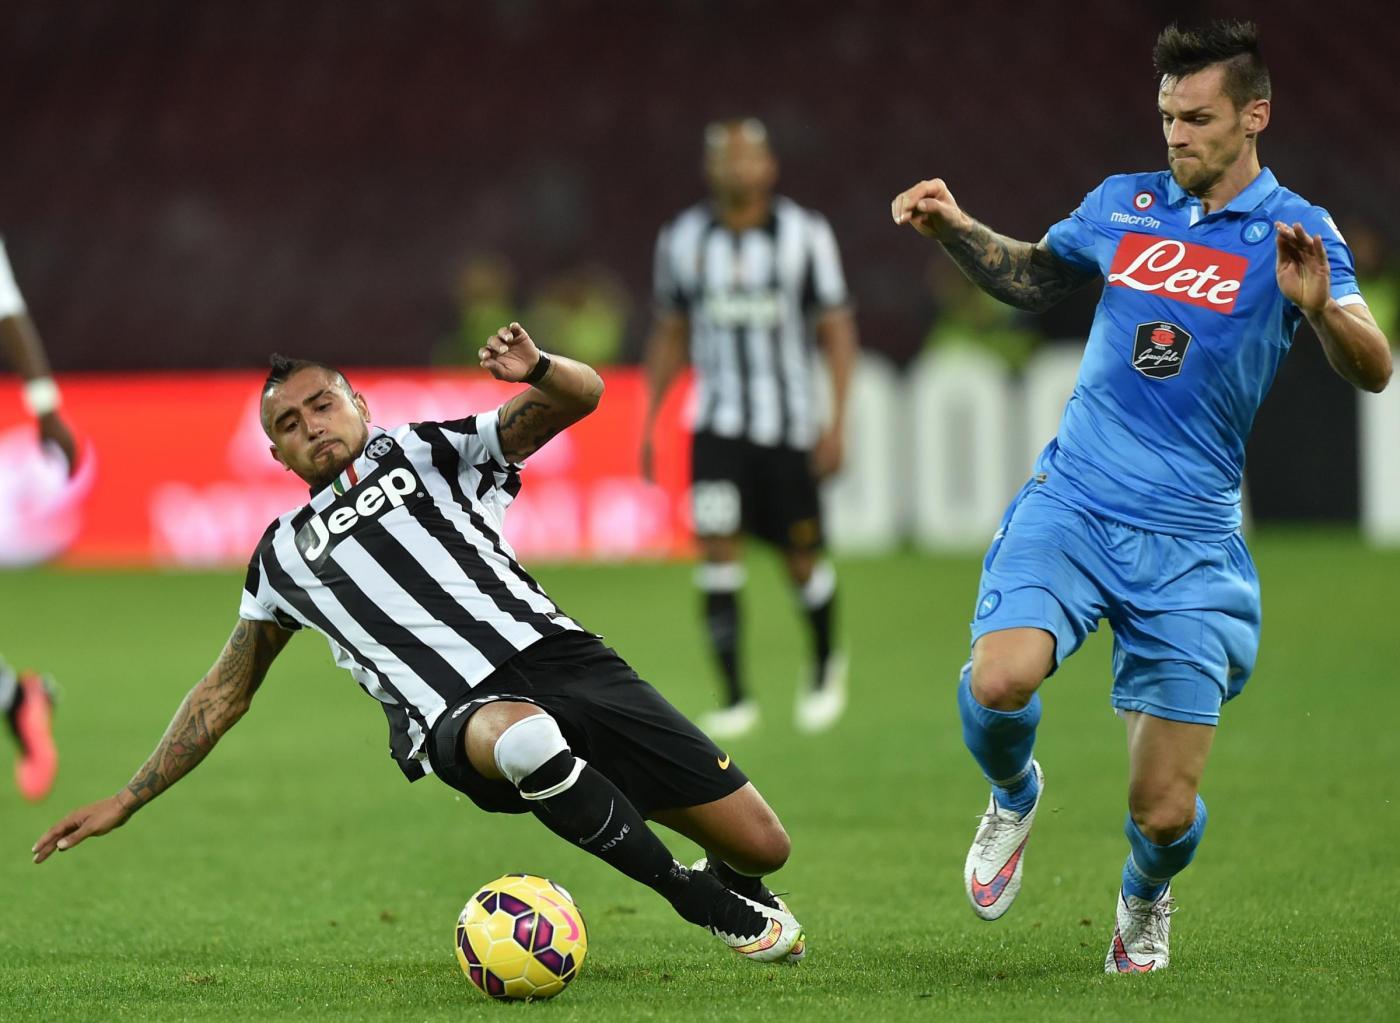 Classifica IFFHS: primo il Real, Juve sesta, Milan 156esimo